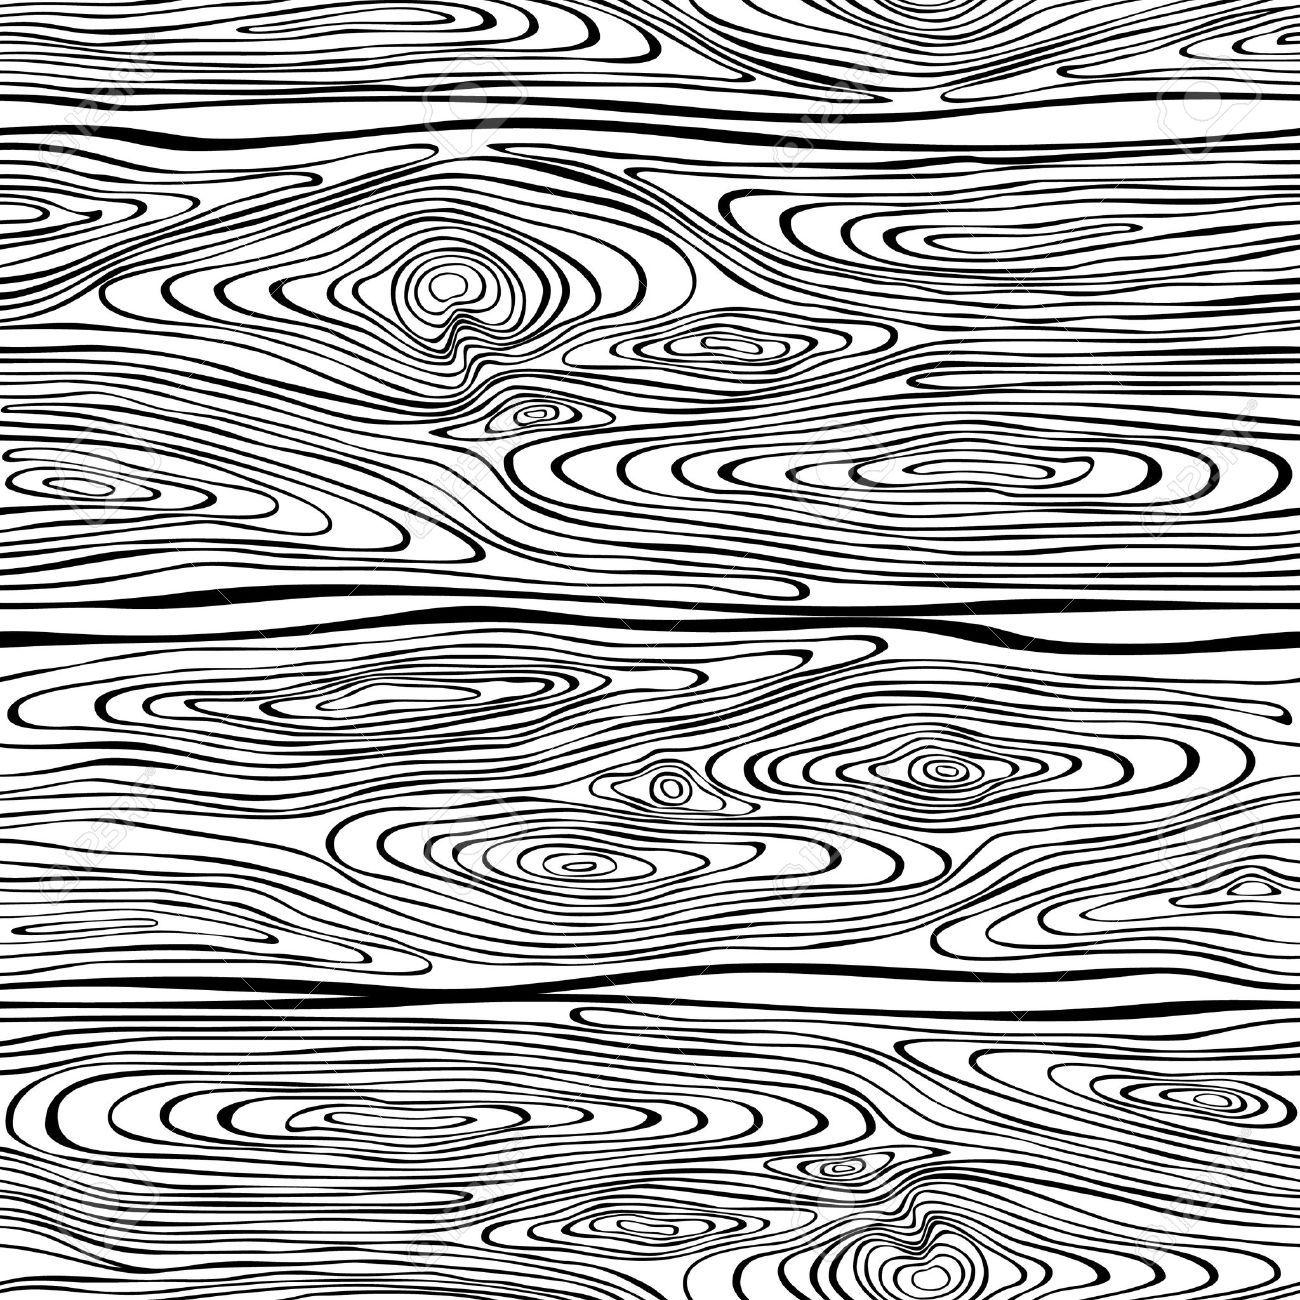 Line Art Wood Grain : Seamless stock vector wood texture g